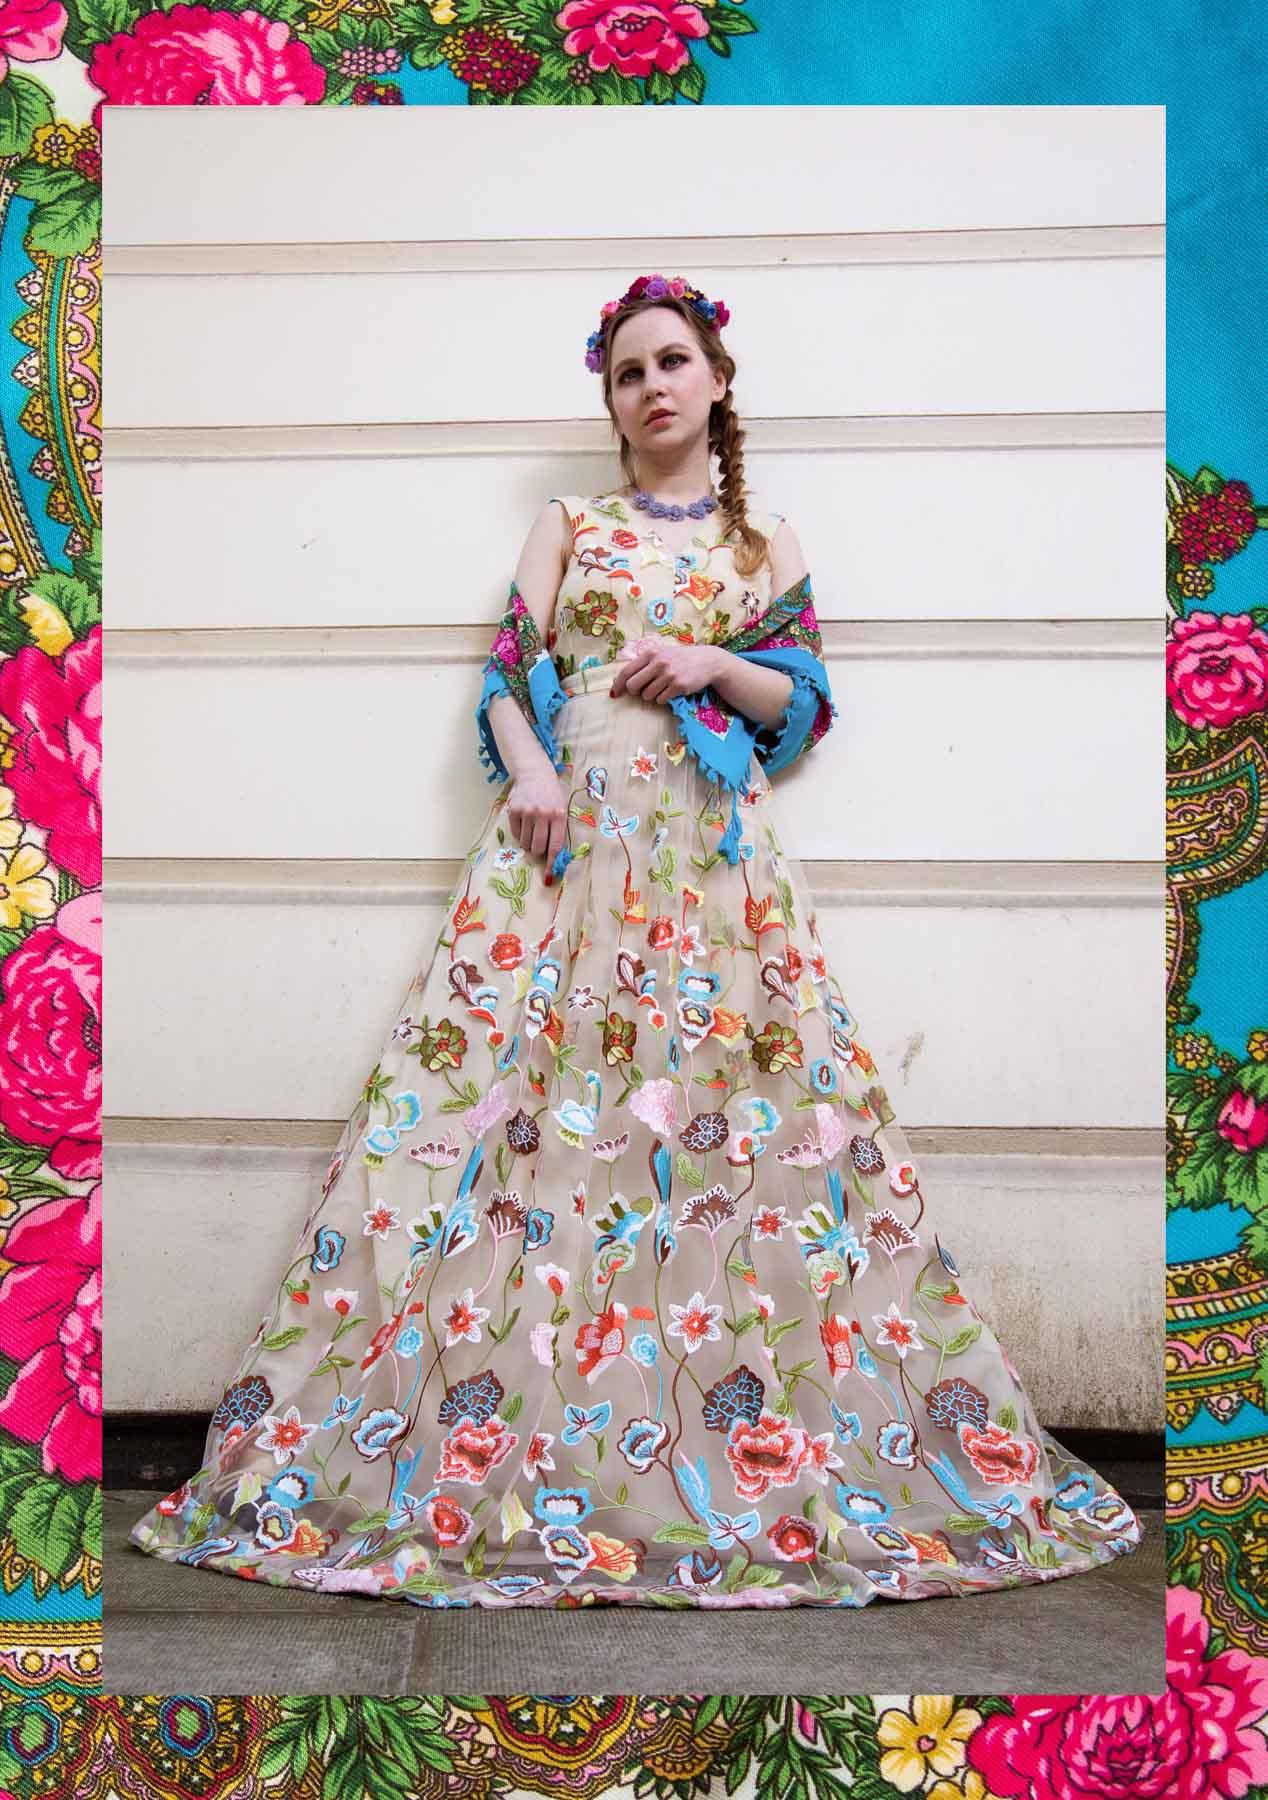 Russian-style-fashion-photographer-london-floral-Русский-стиль-мода-павловопосадский-платок-natalia-smith-photography-0080.jpg